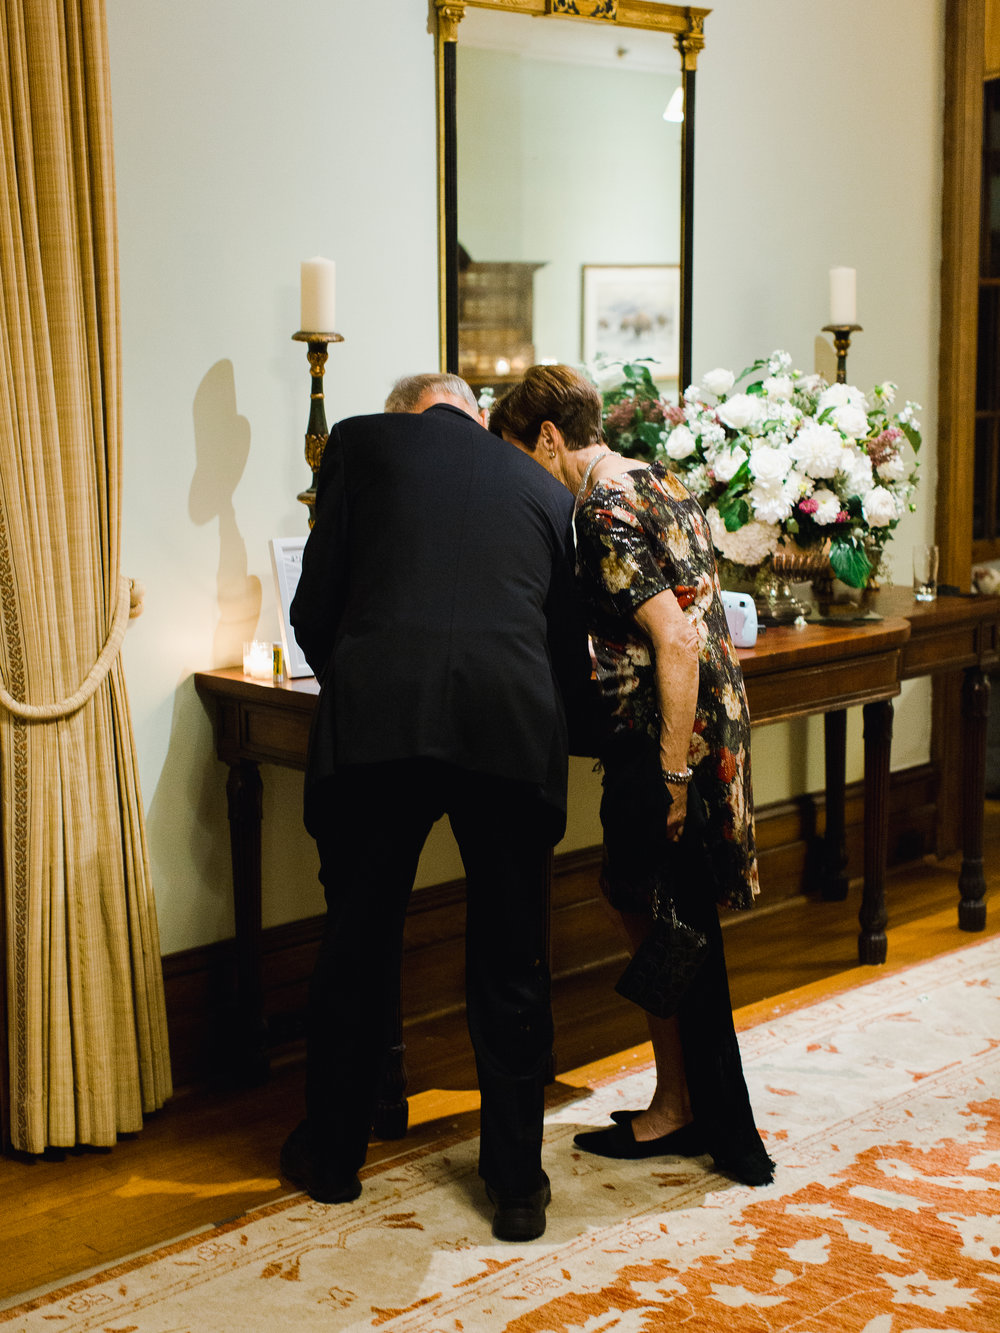 0740-Geneva-Ian-Wedding-Toronto Golf Club-When He Found Her-TorontoPhotographer.jpg